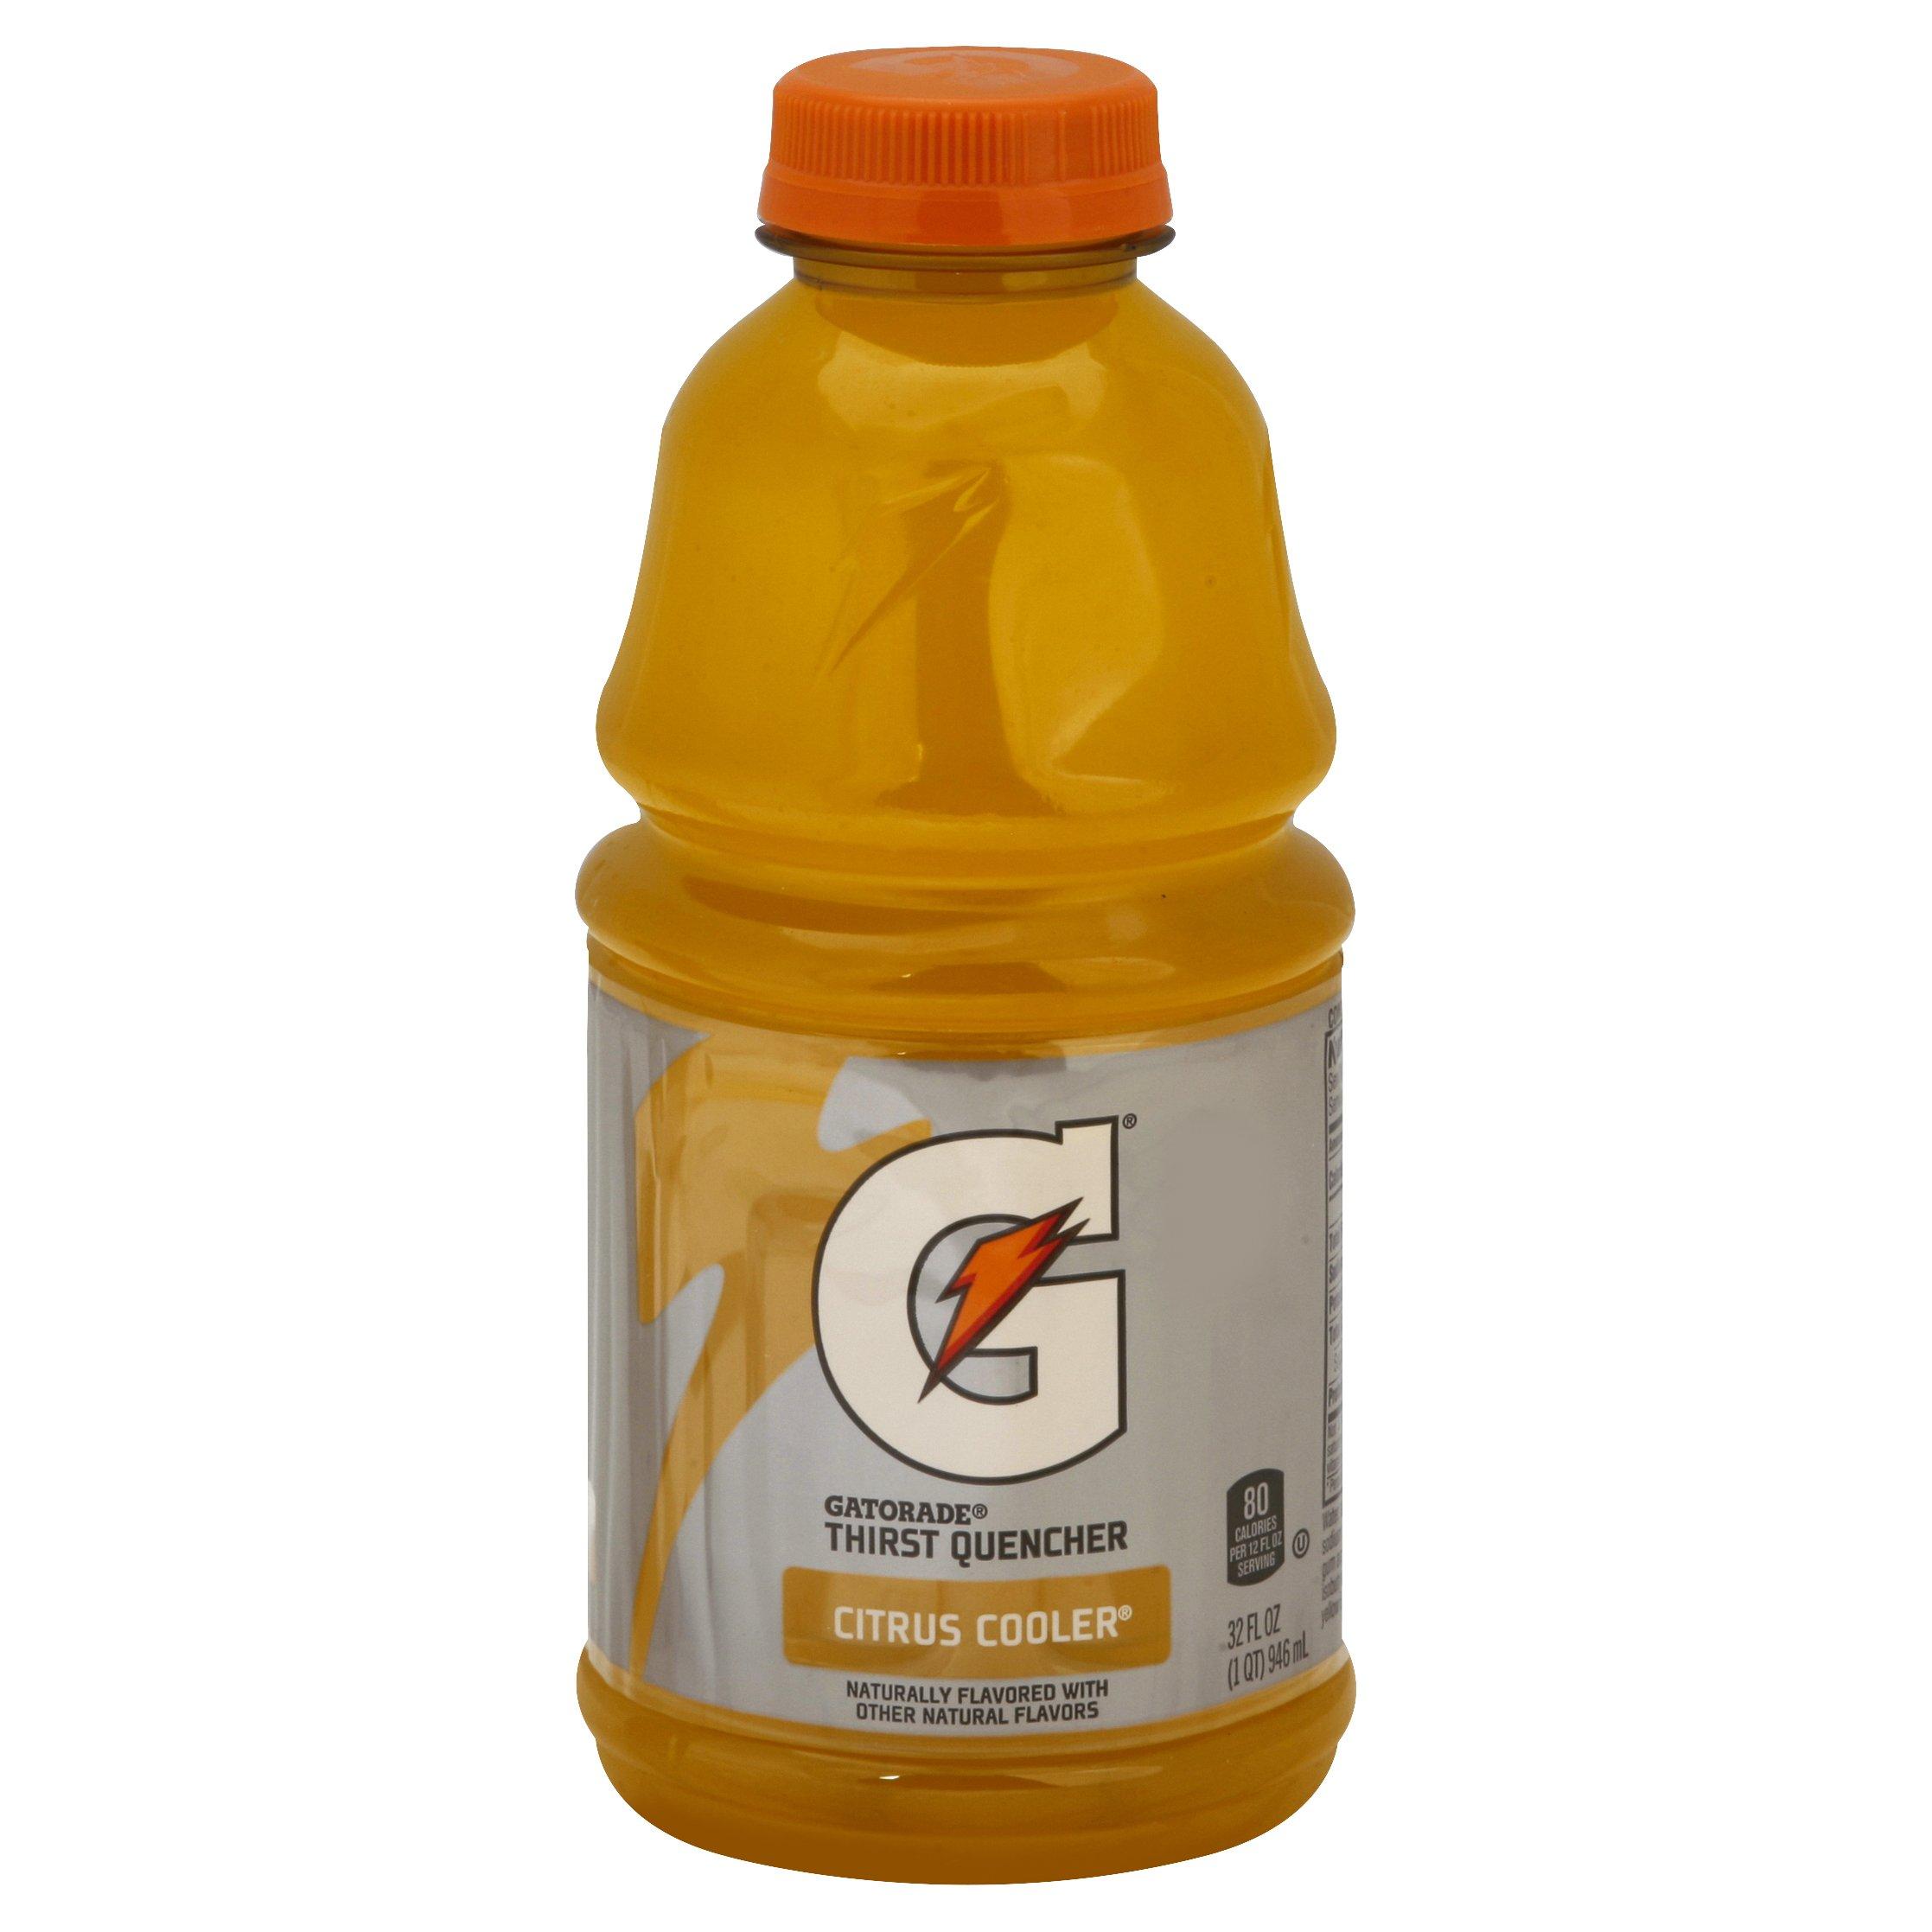 Gatorade Citrus Cooler Sports Drink 32OZ 12-Pack